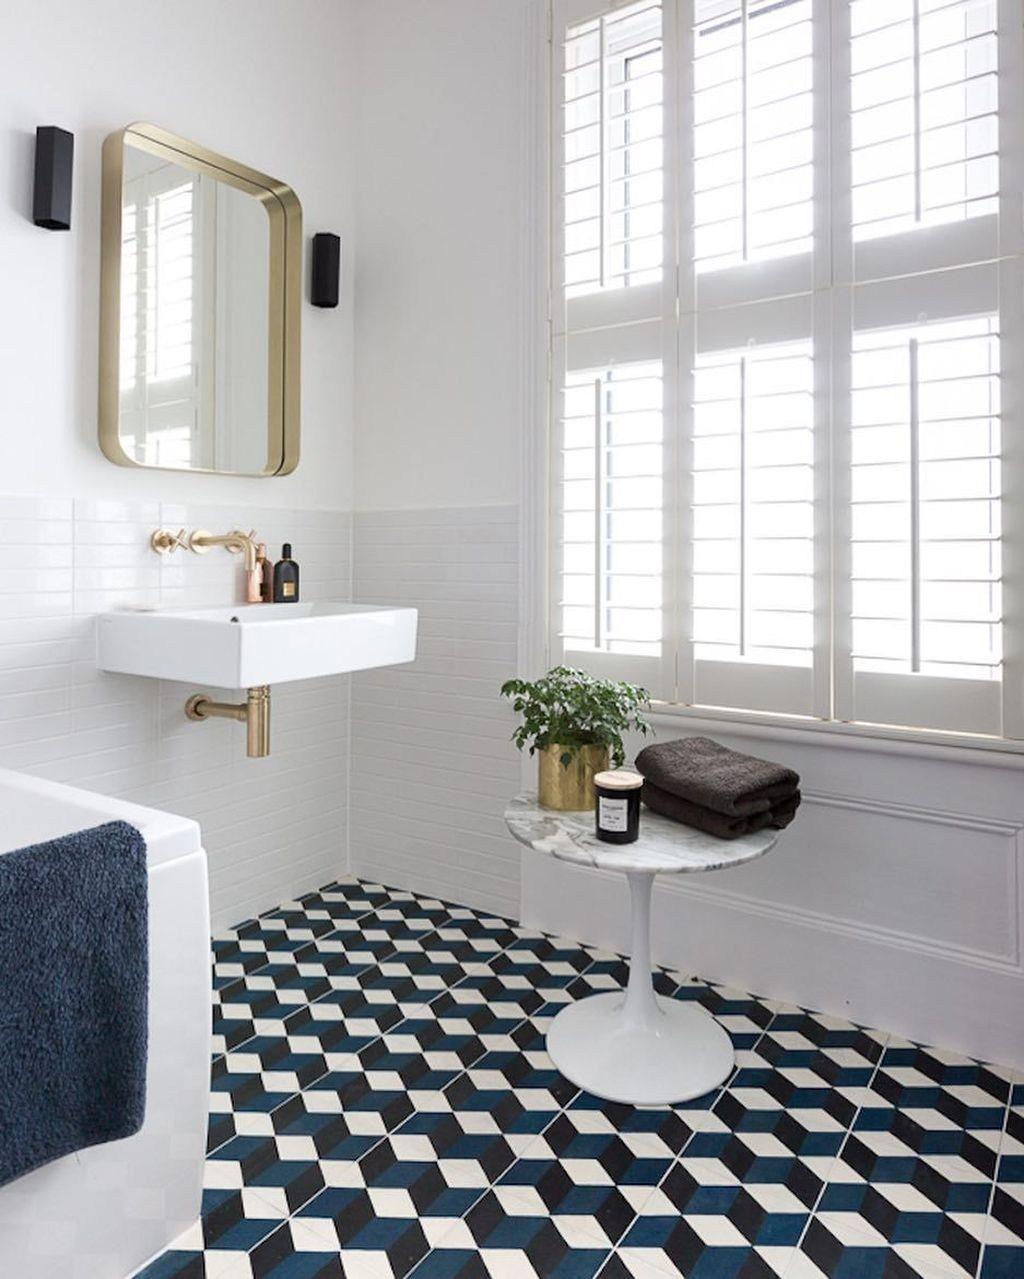 38 Lovely Geometrical Tiles Ideas For Your Bathroom Decoration Patterned Floor Tiles Blue Tile Floor White Bathroom Black and white bathroom floor tile